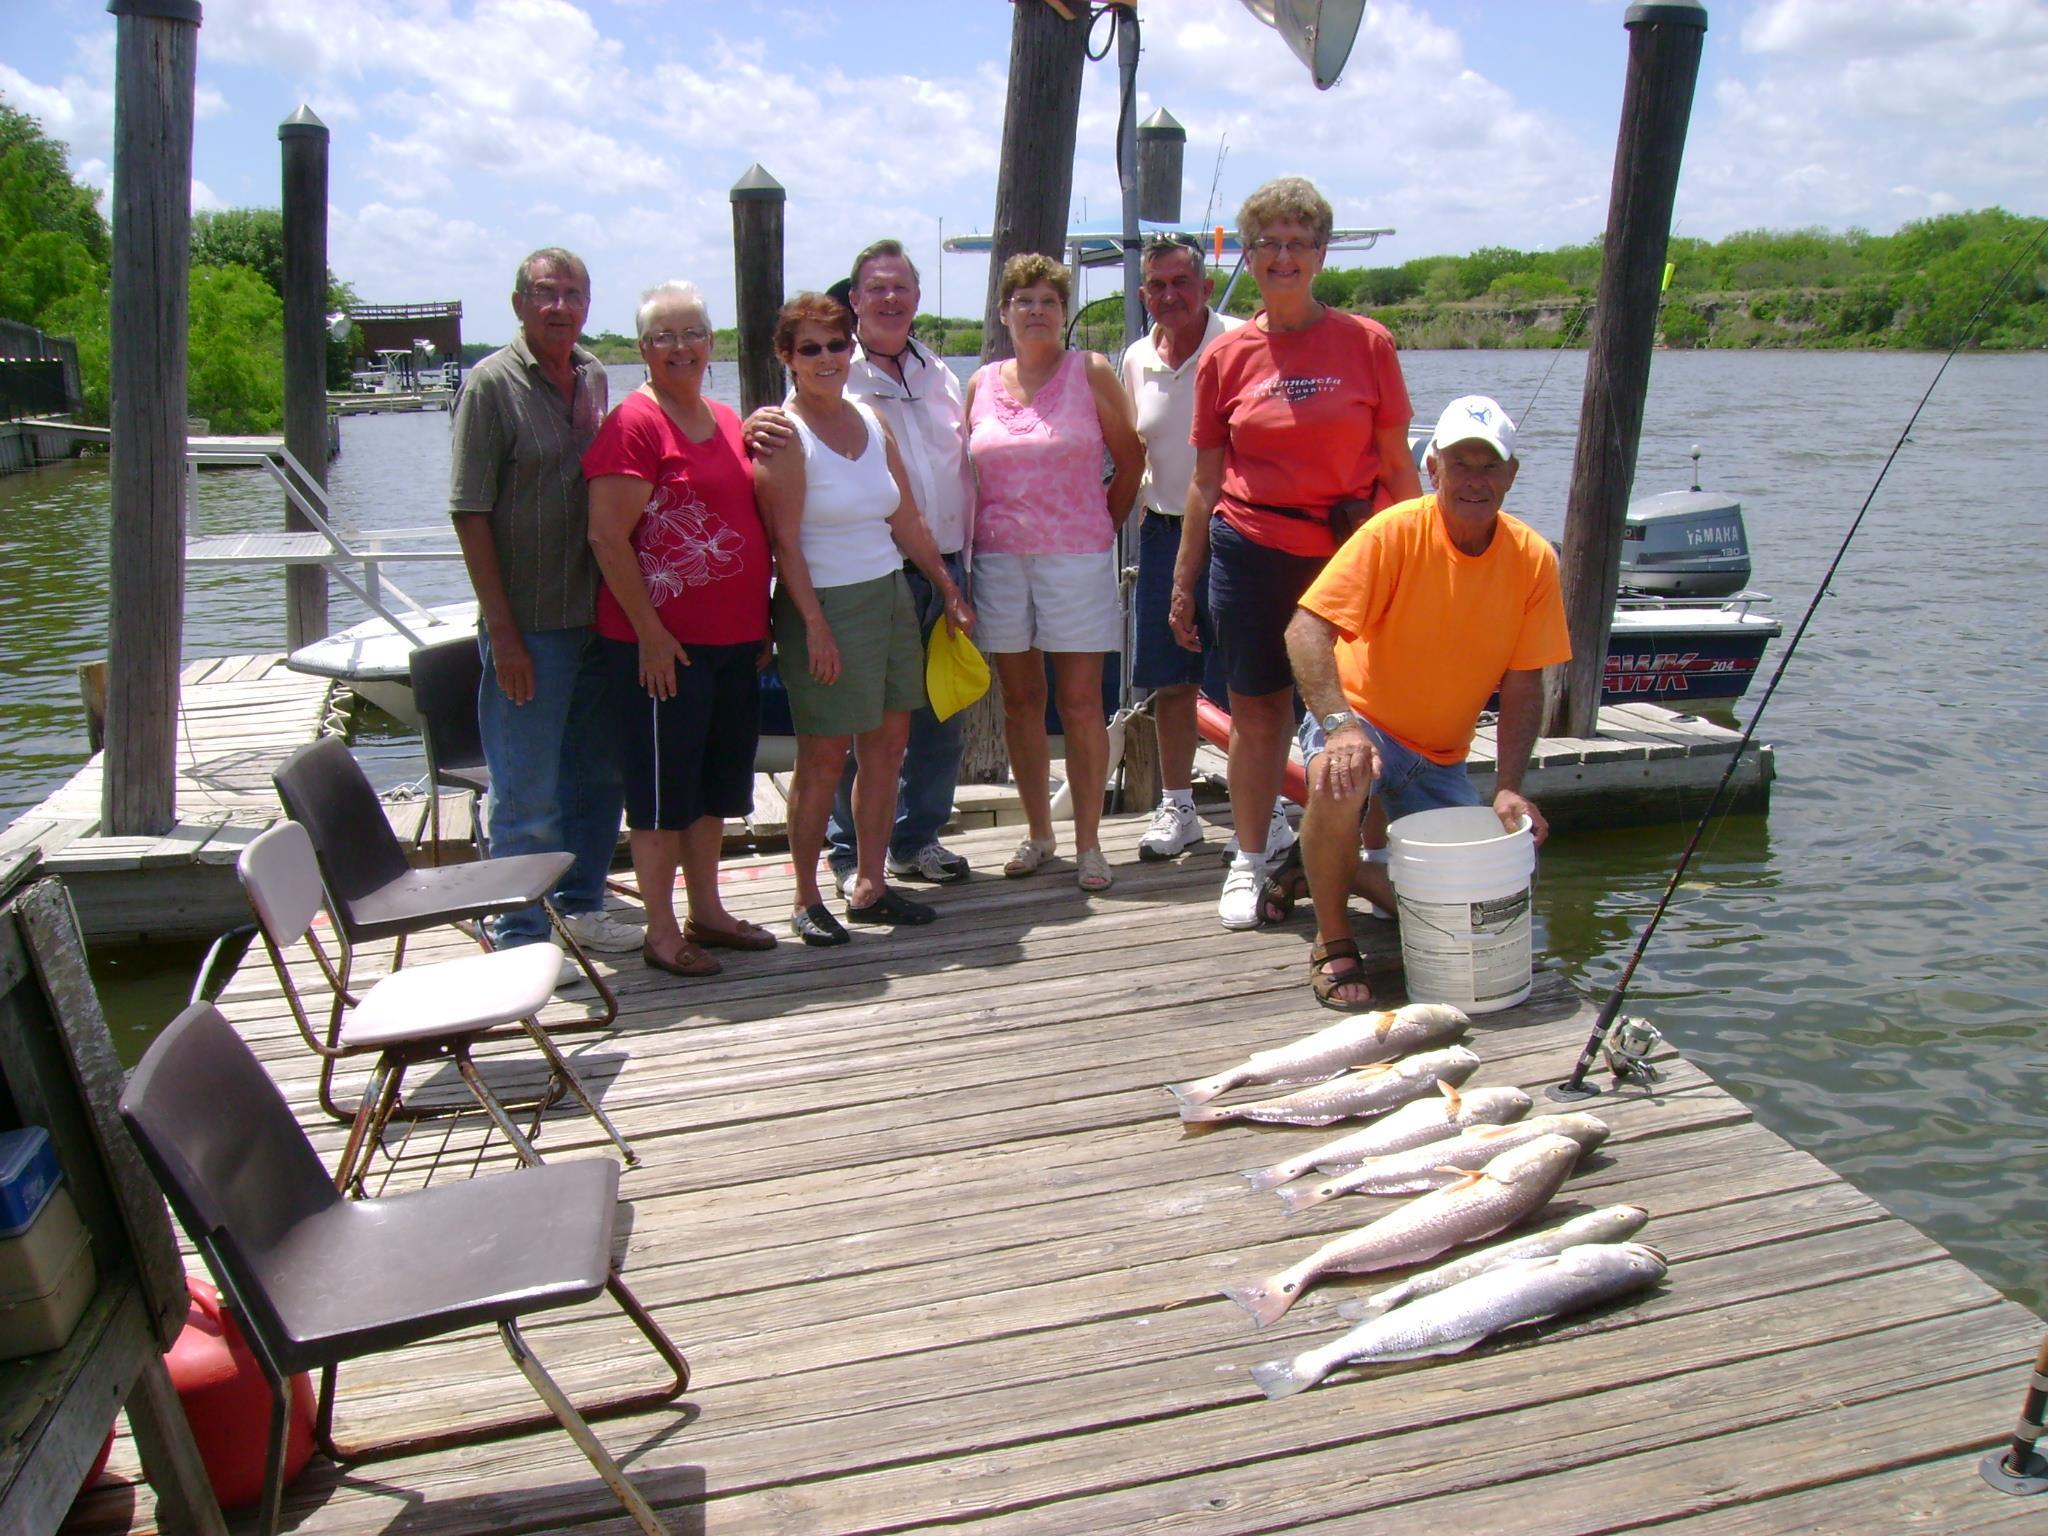 Beau Arroyo City Fishing Piers South TX Bed And Breakfast Rio Hondo